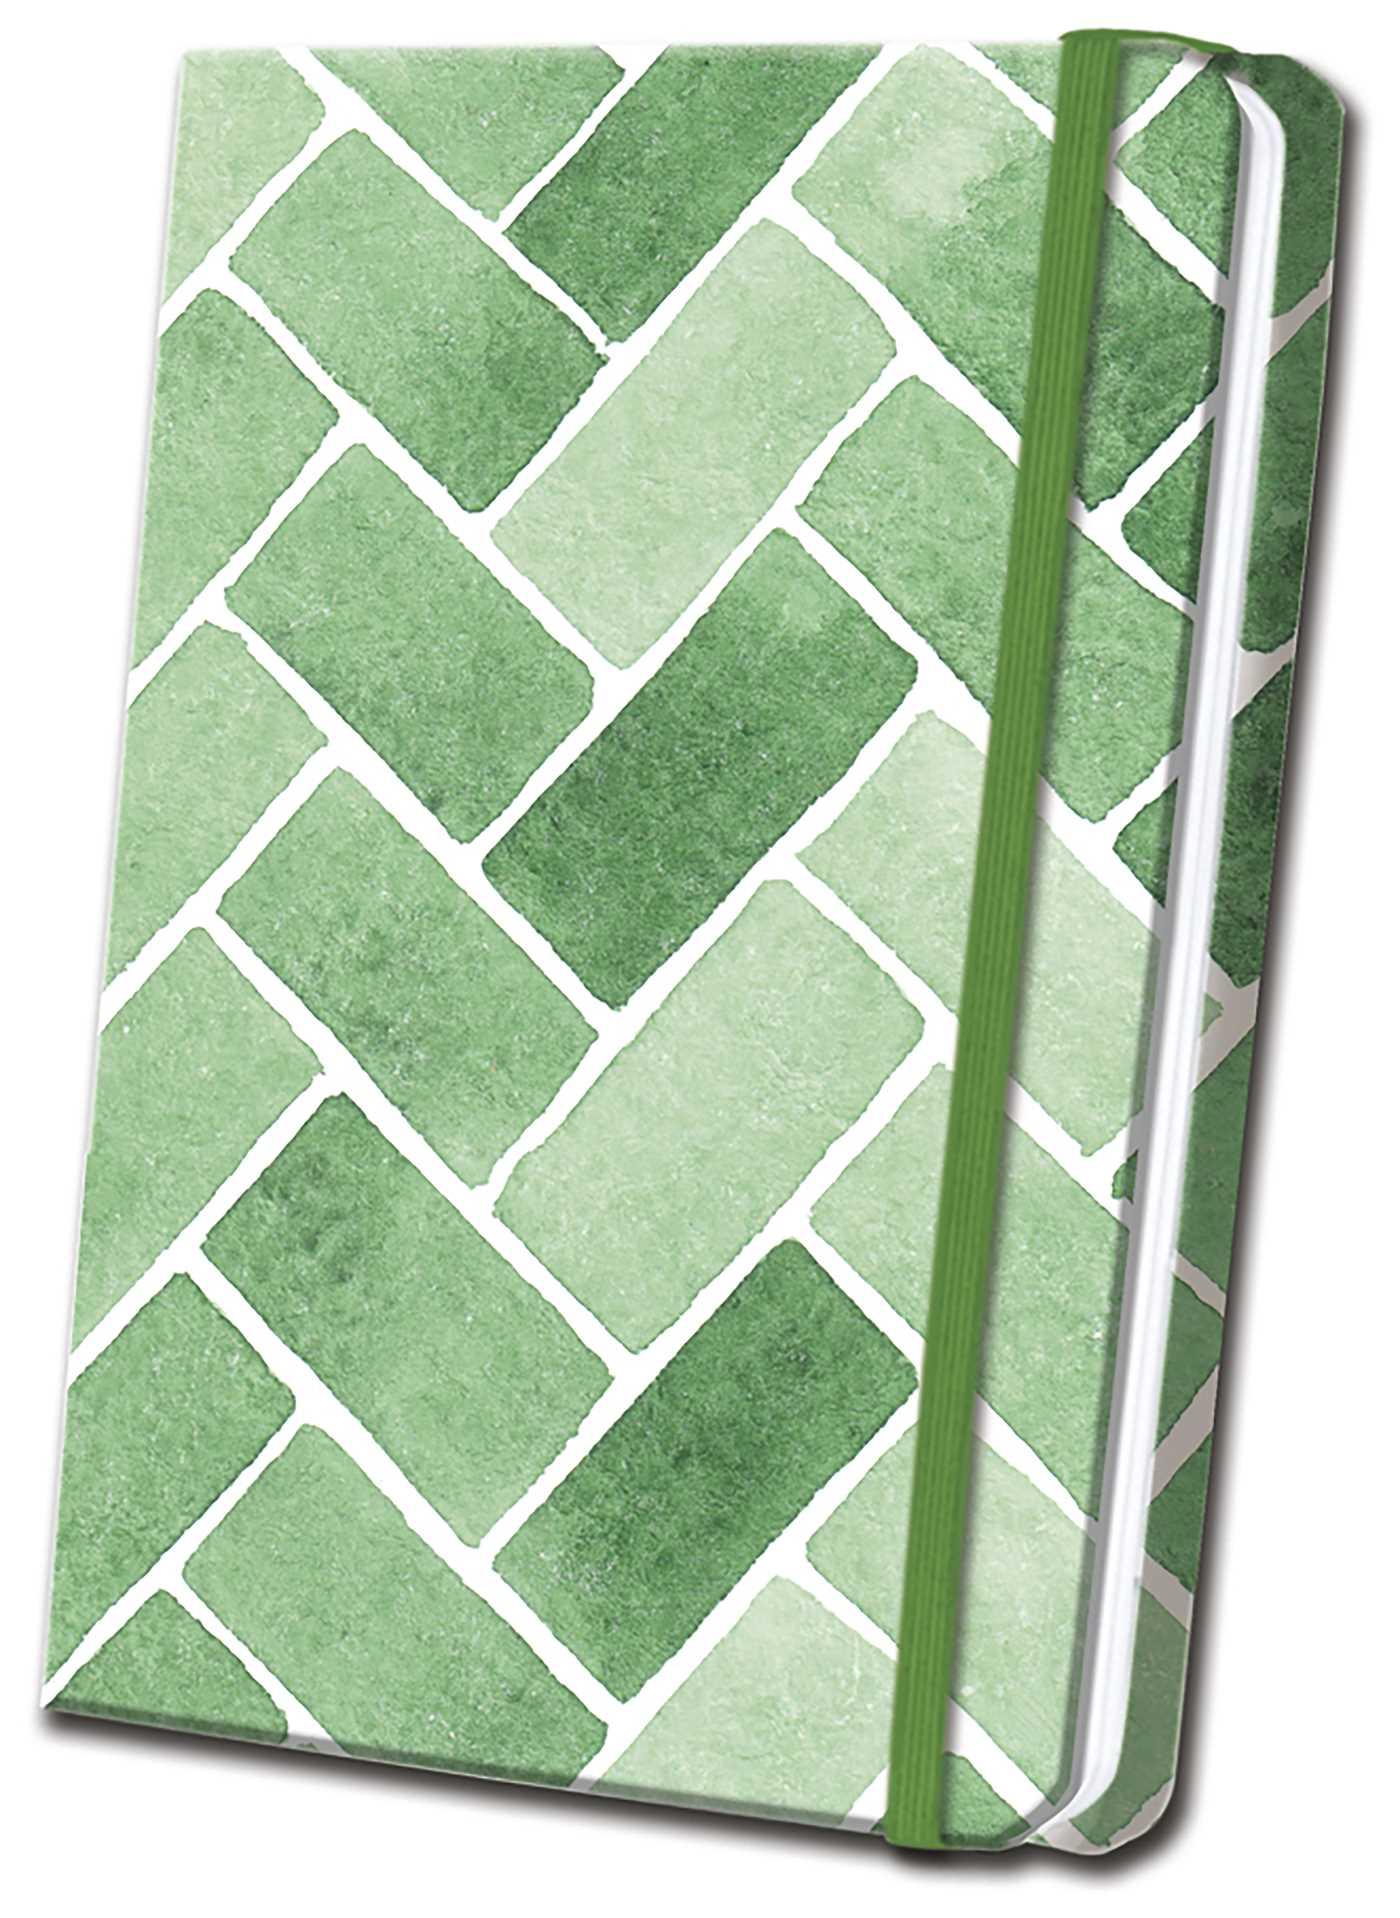 Green tile linen journal 9781684127214 hr